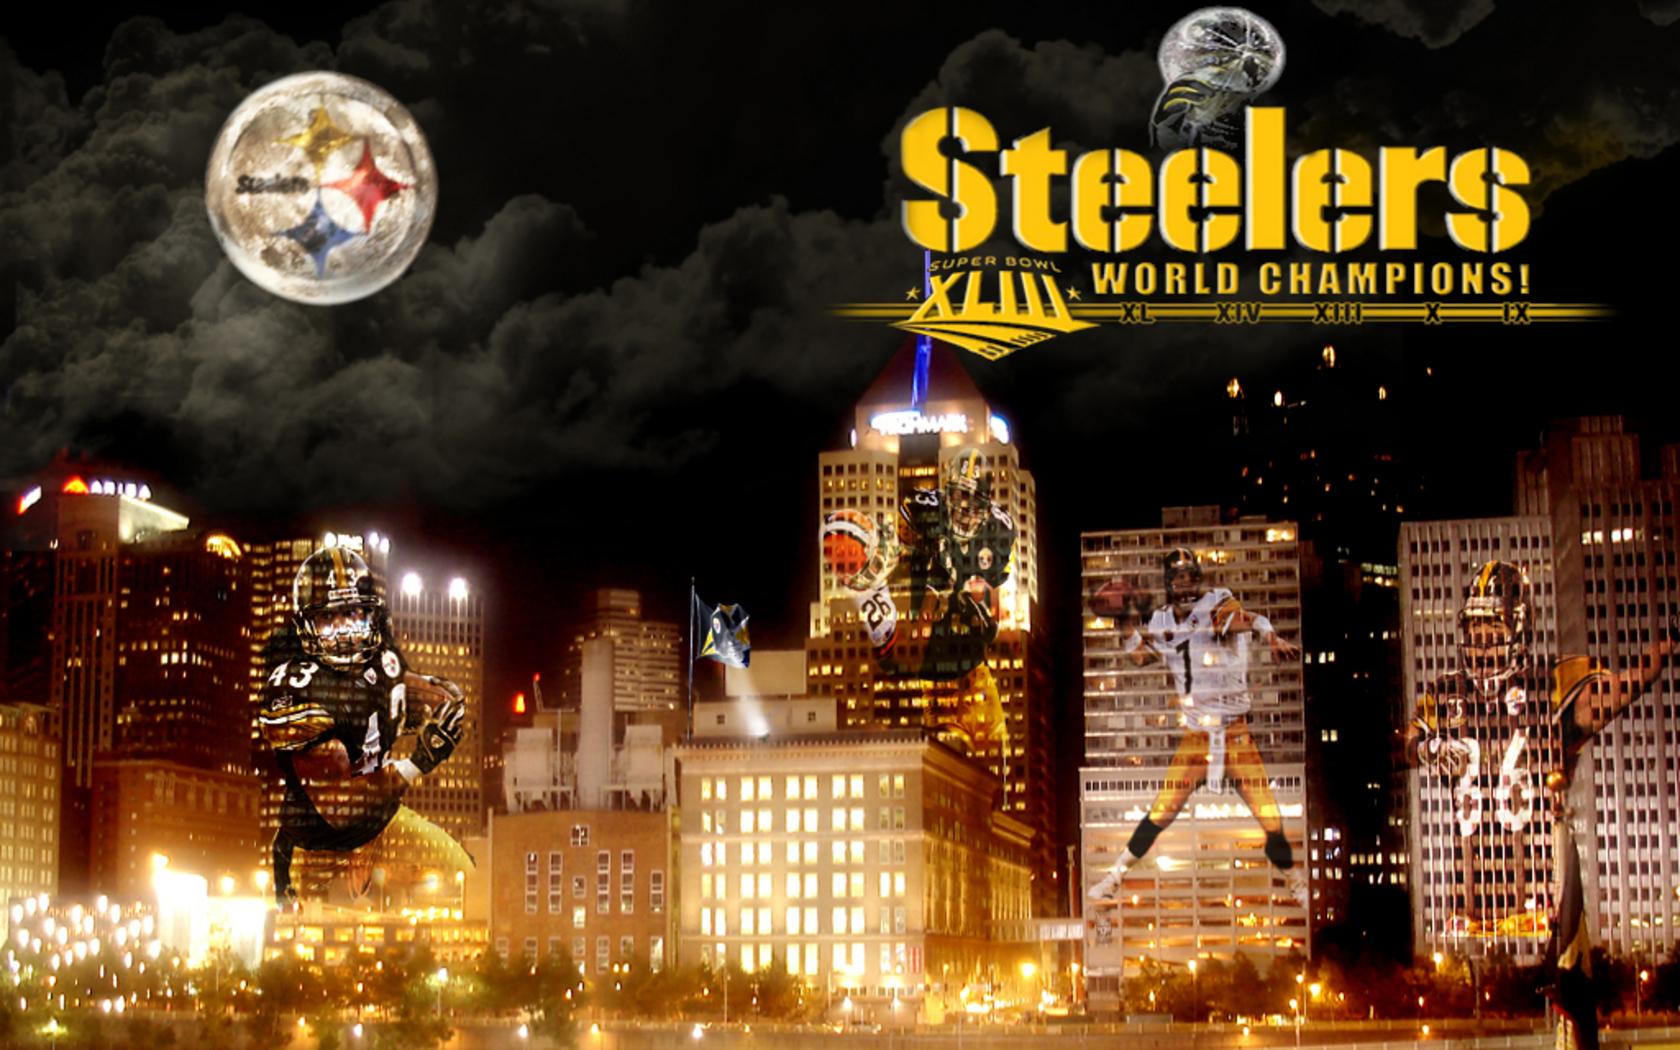 Pittsburgh Steelers Wallpaper 69 Download Screensavers 1680x1050